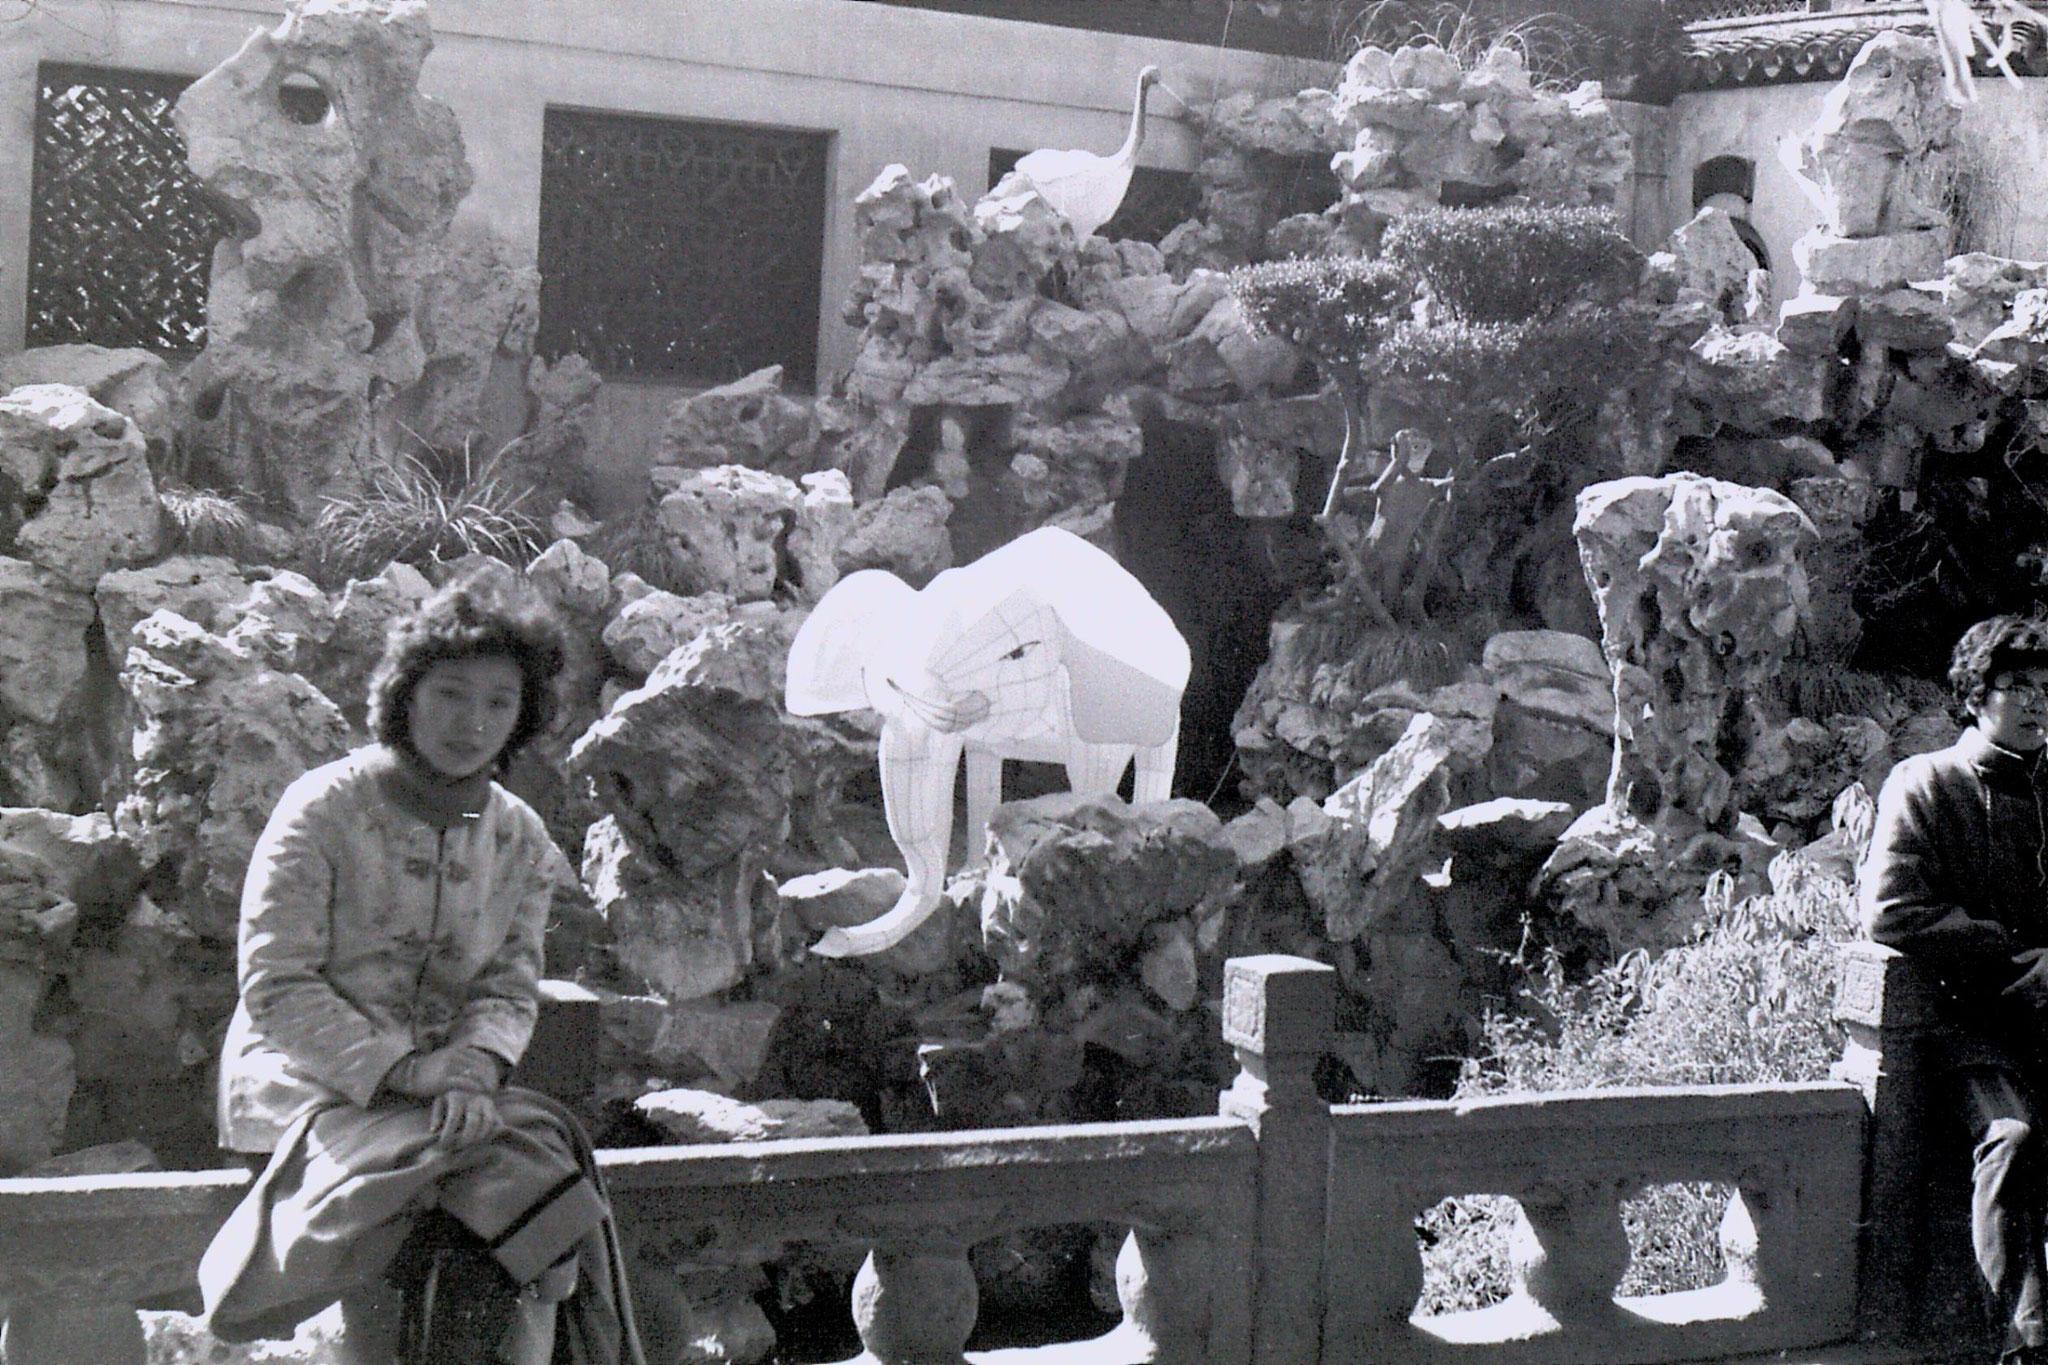 10/2/1989: 1: Shanghai Yuyuan Gardens